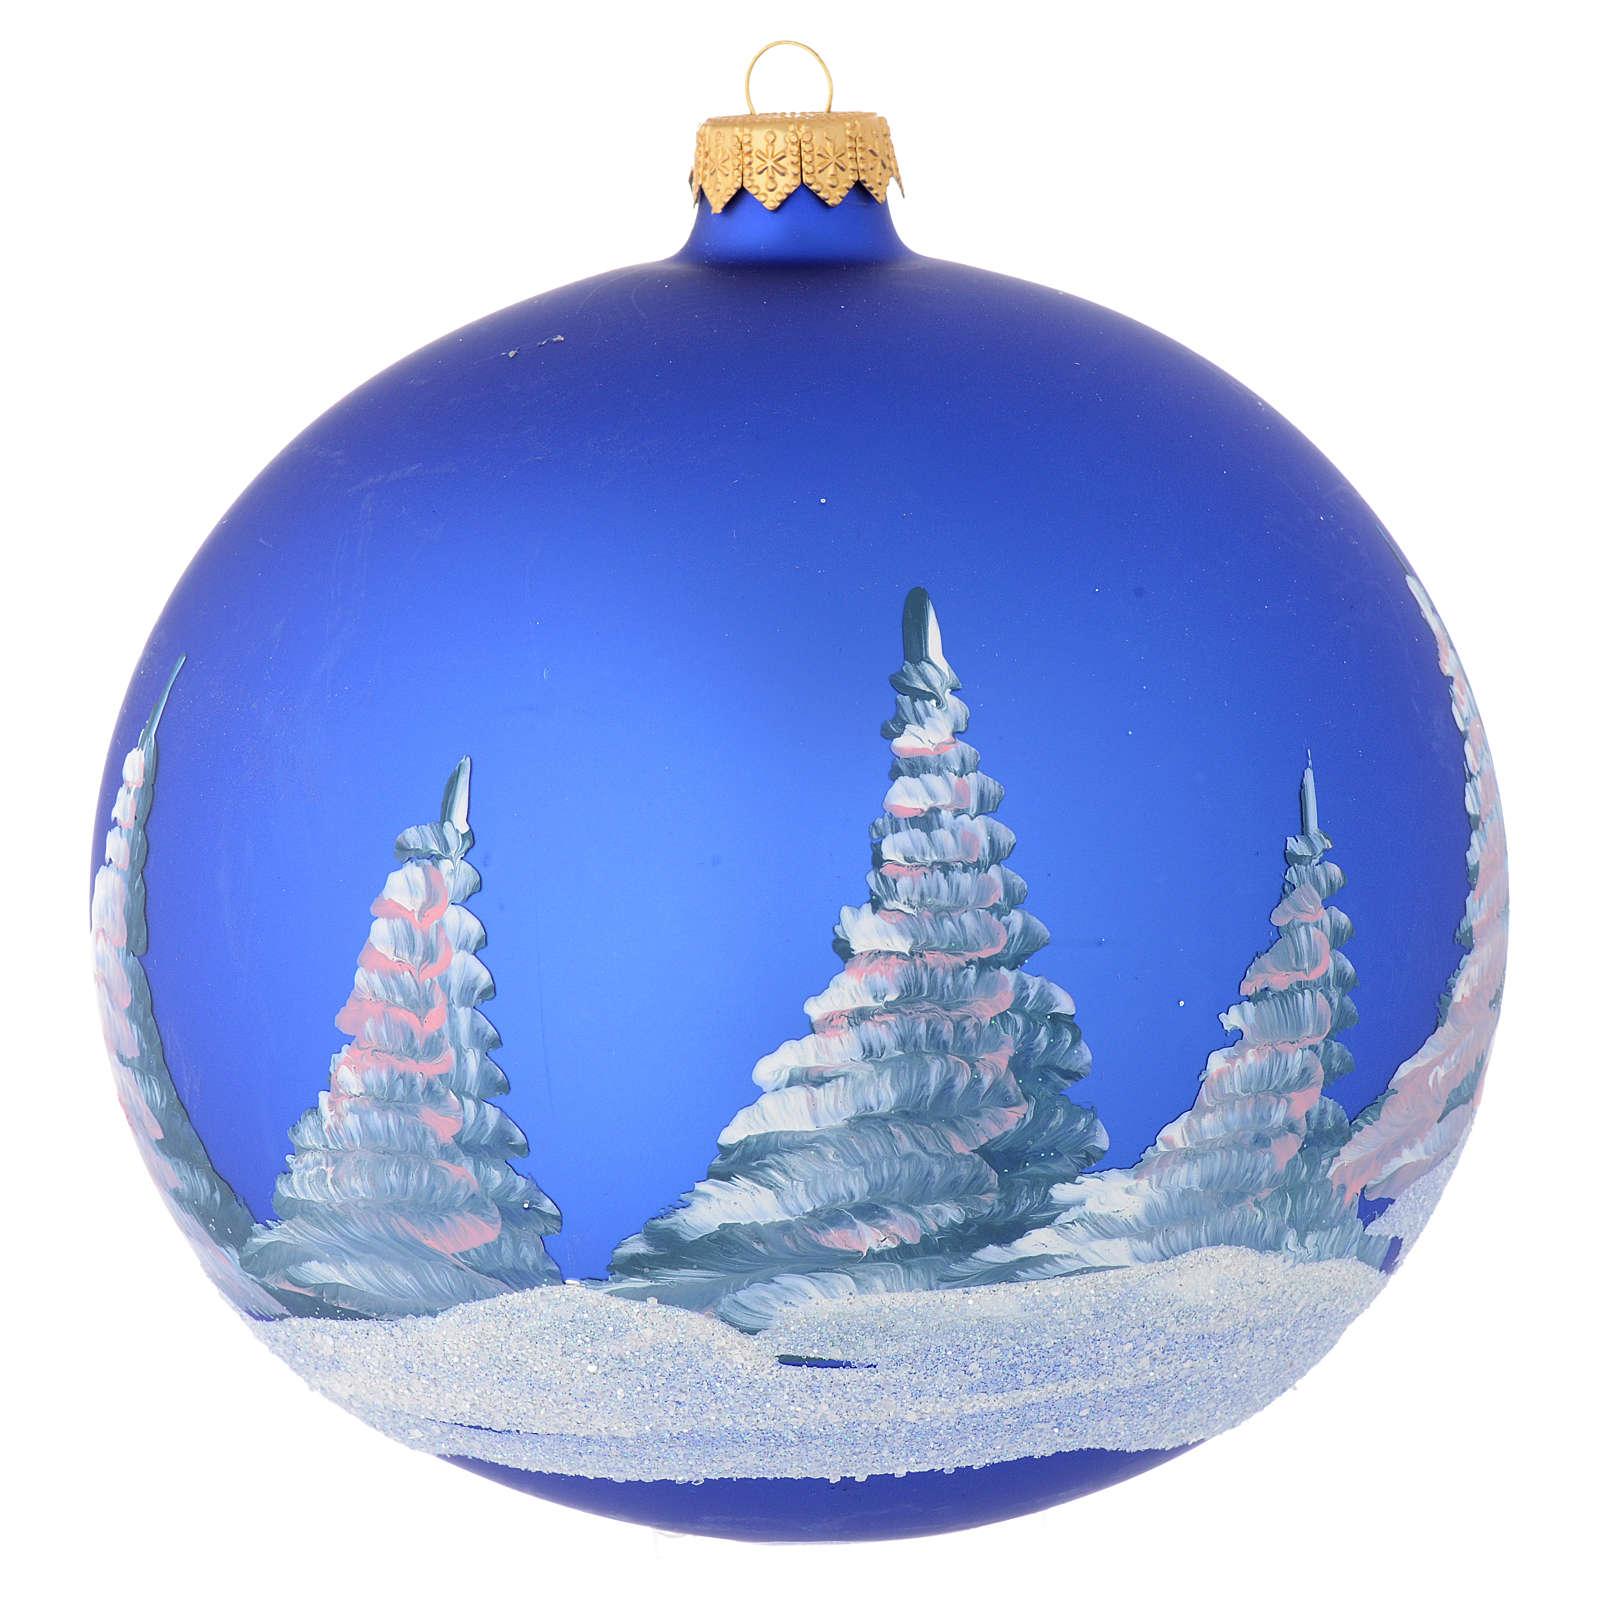 Bola de Navidad vidrio soplado azul paisaje decoupage 150 mm 4